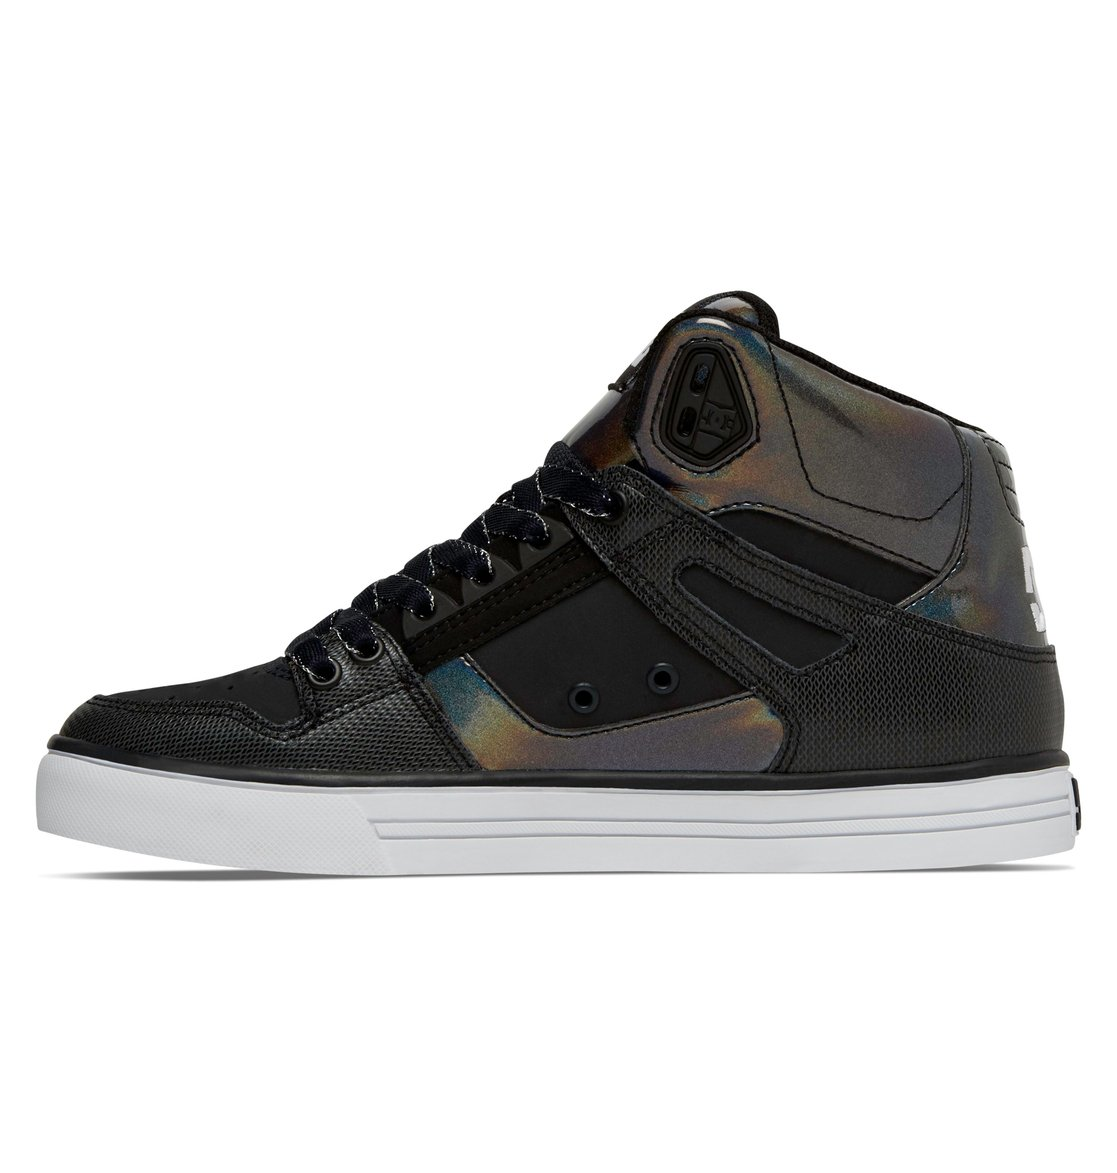 e6af71ffb6 2 Spartan High Wc Se ADJS400009 DC Shoes